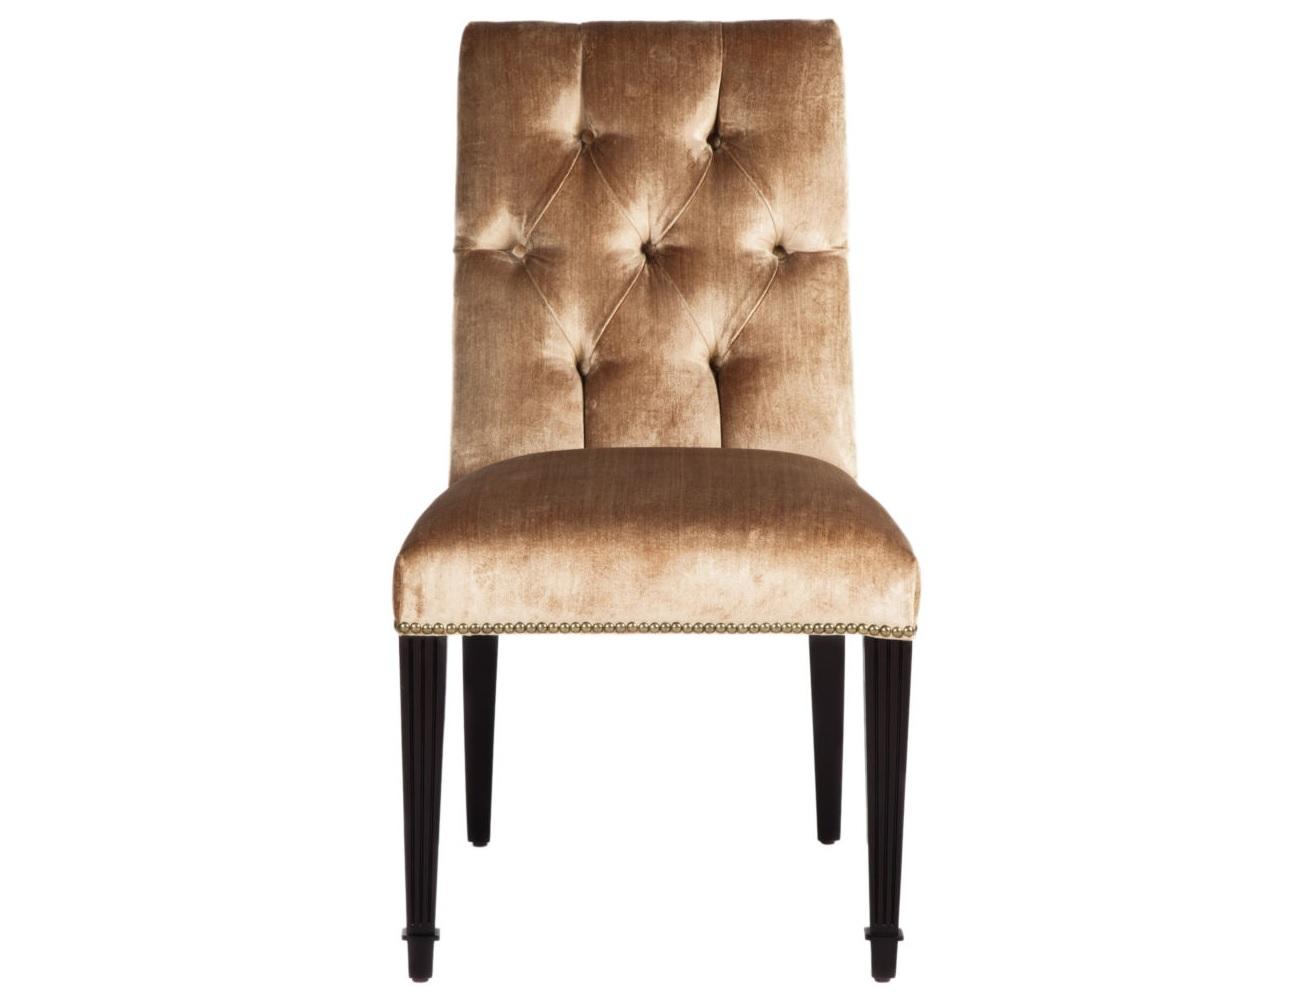 Кухонный стул M-Style 15436448 от thefurnish